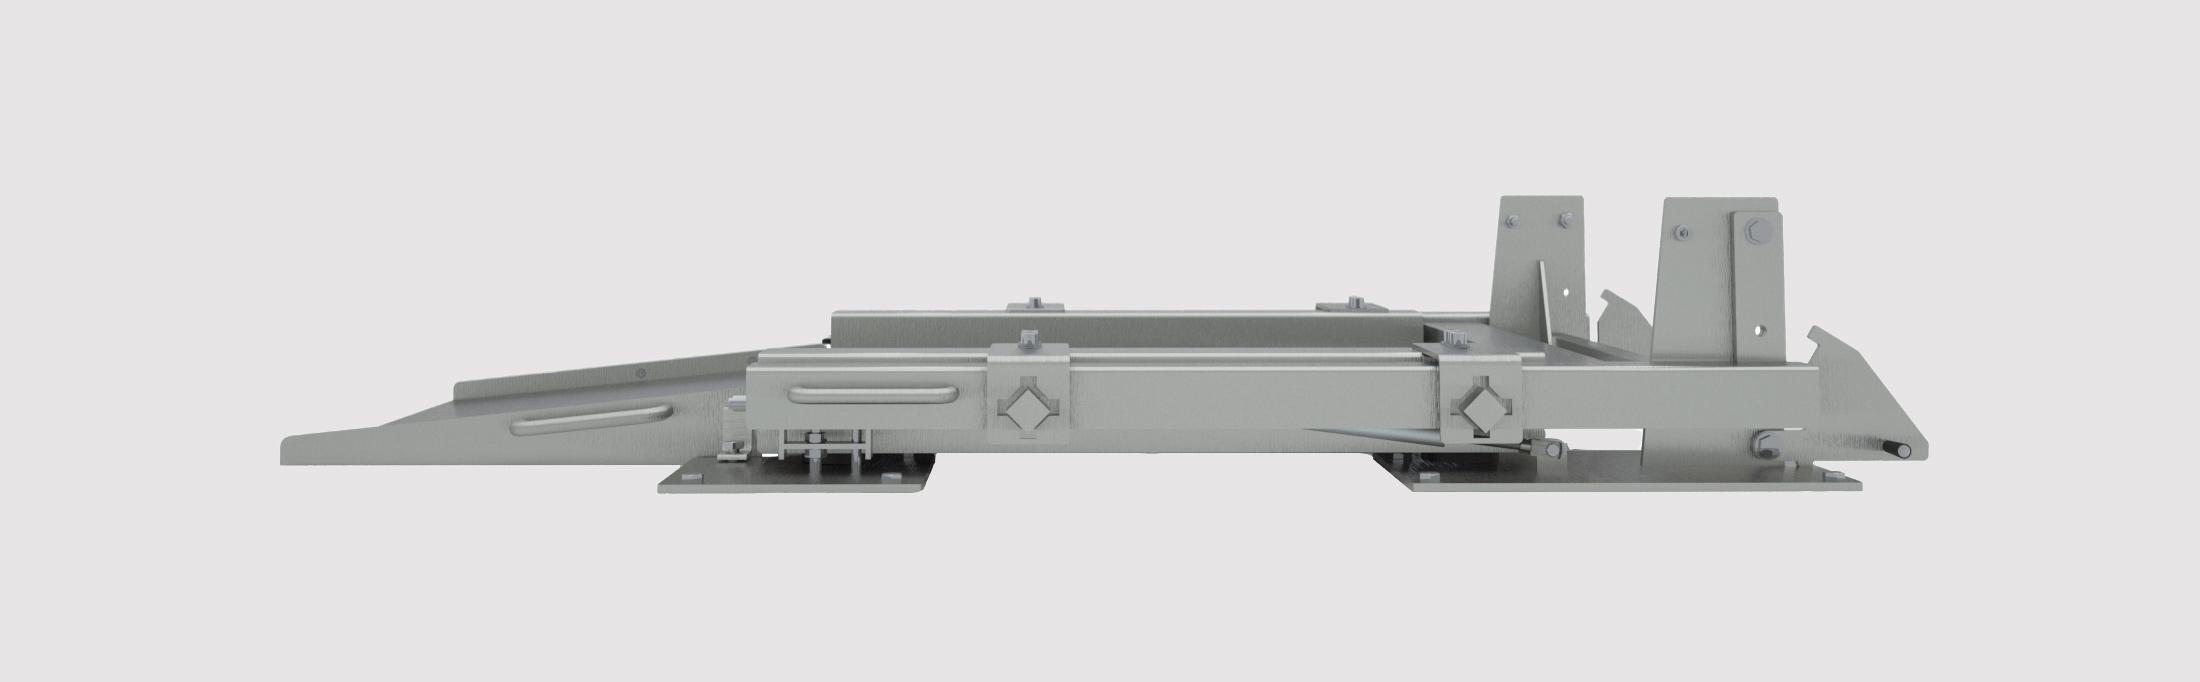 Bodenwaage extra flach - linke Seite